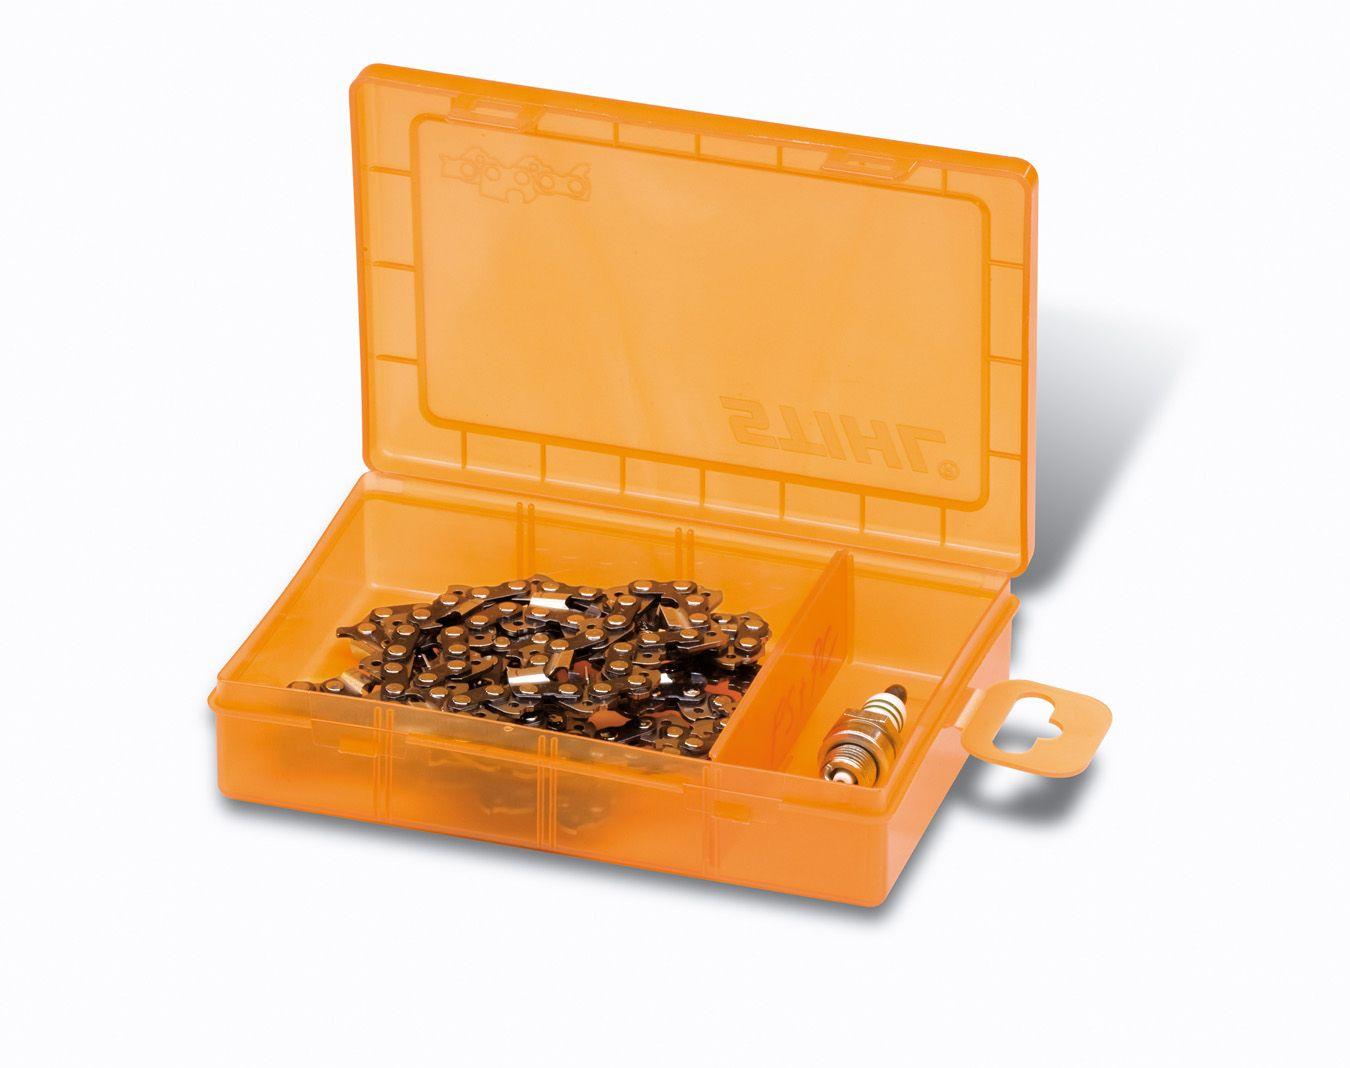 Stihl Storage Case For Saw Chains